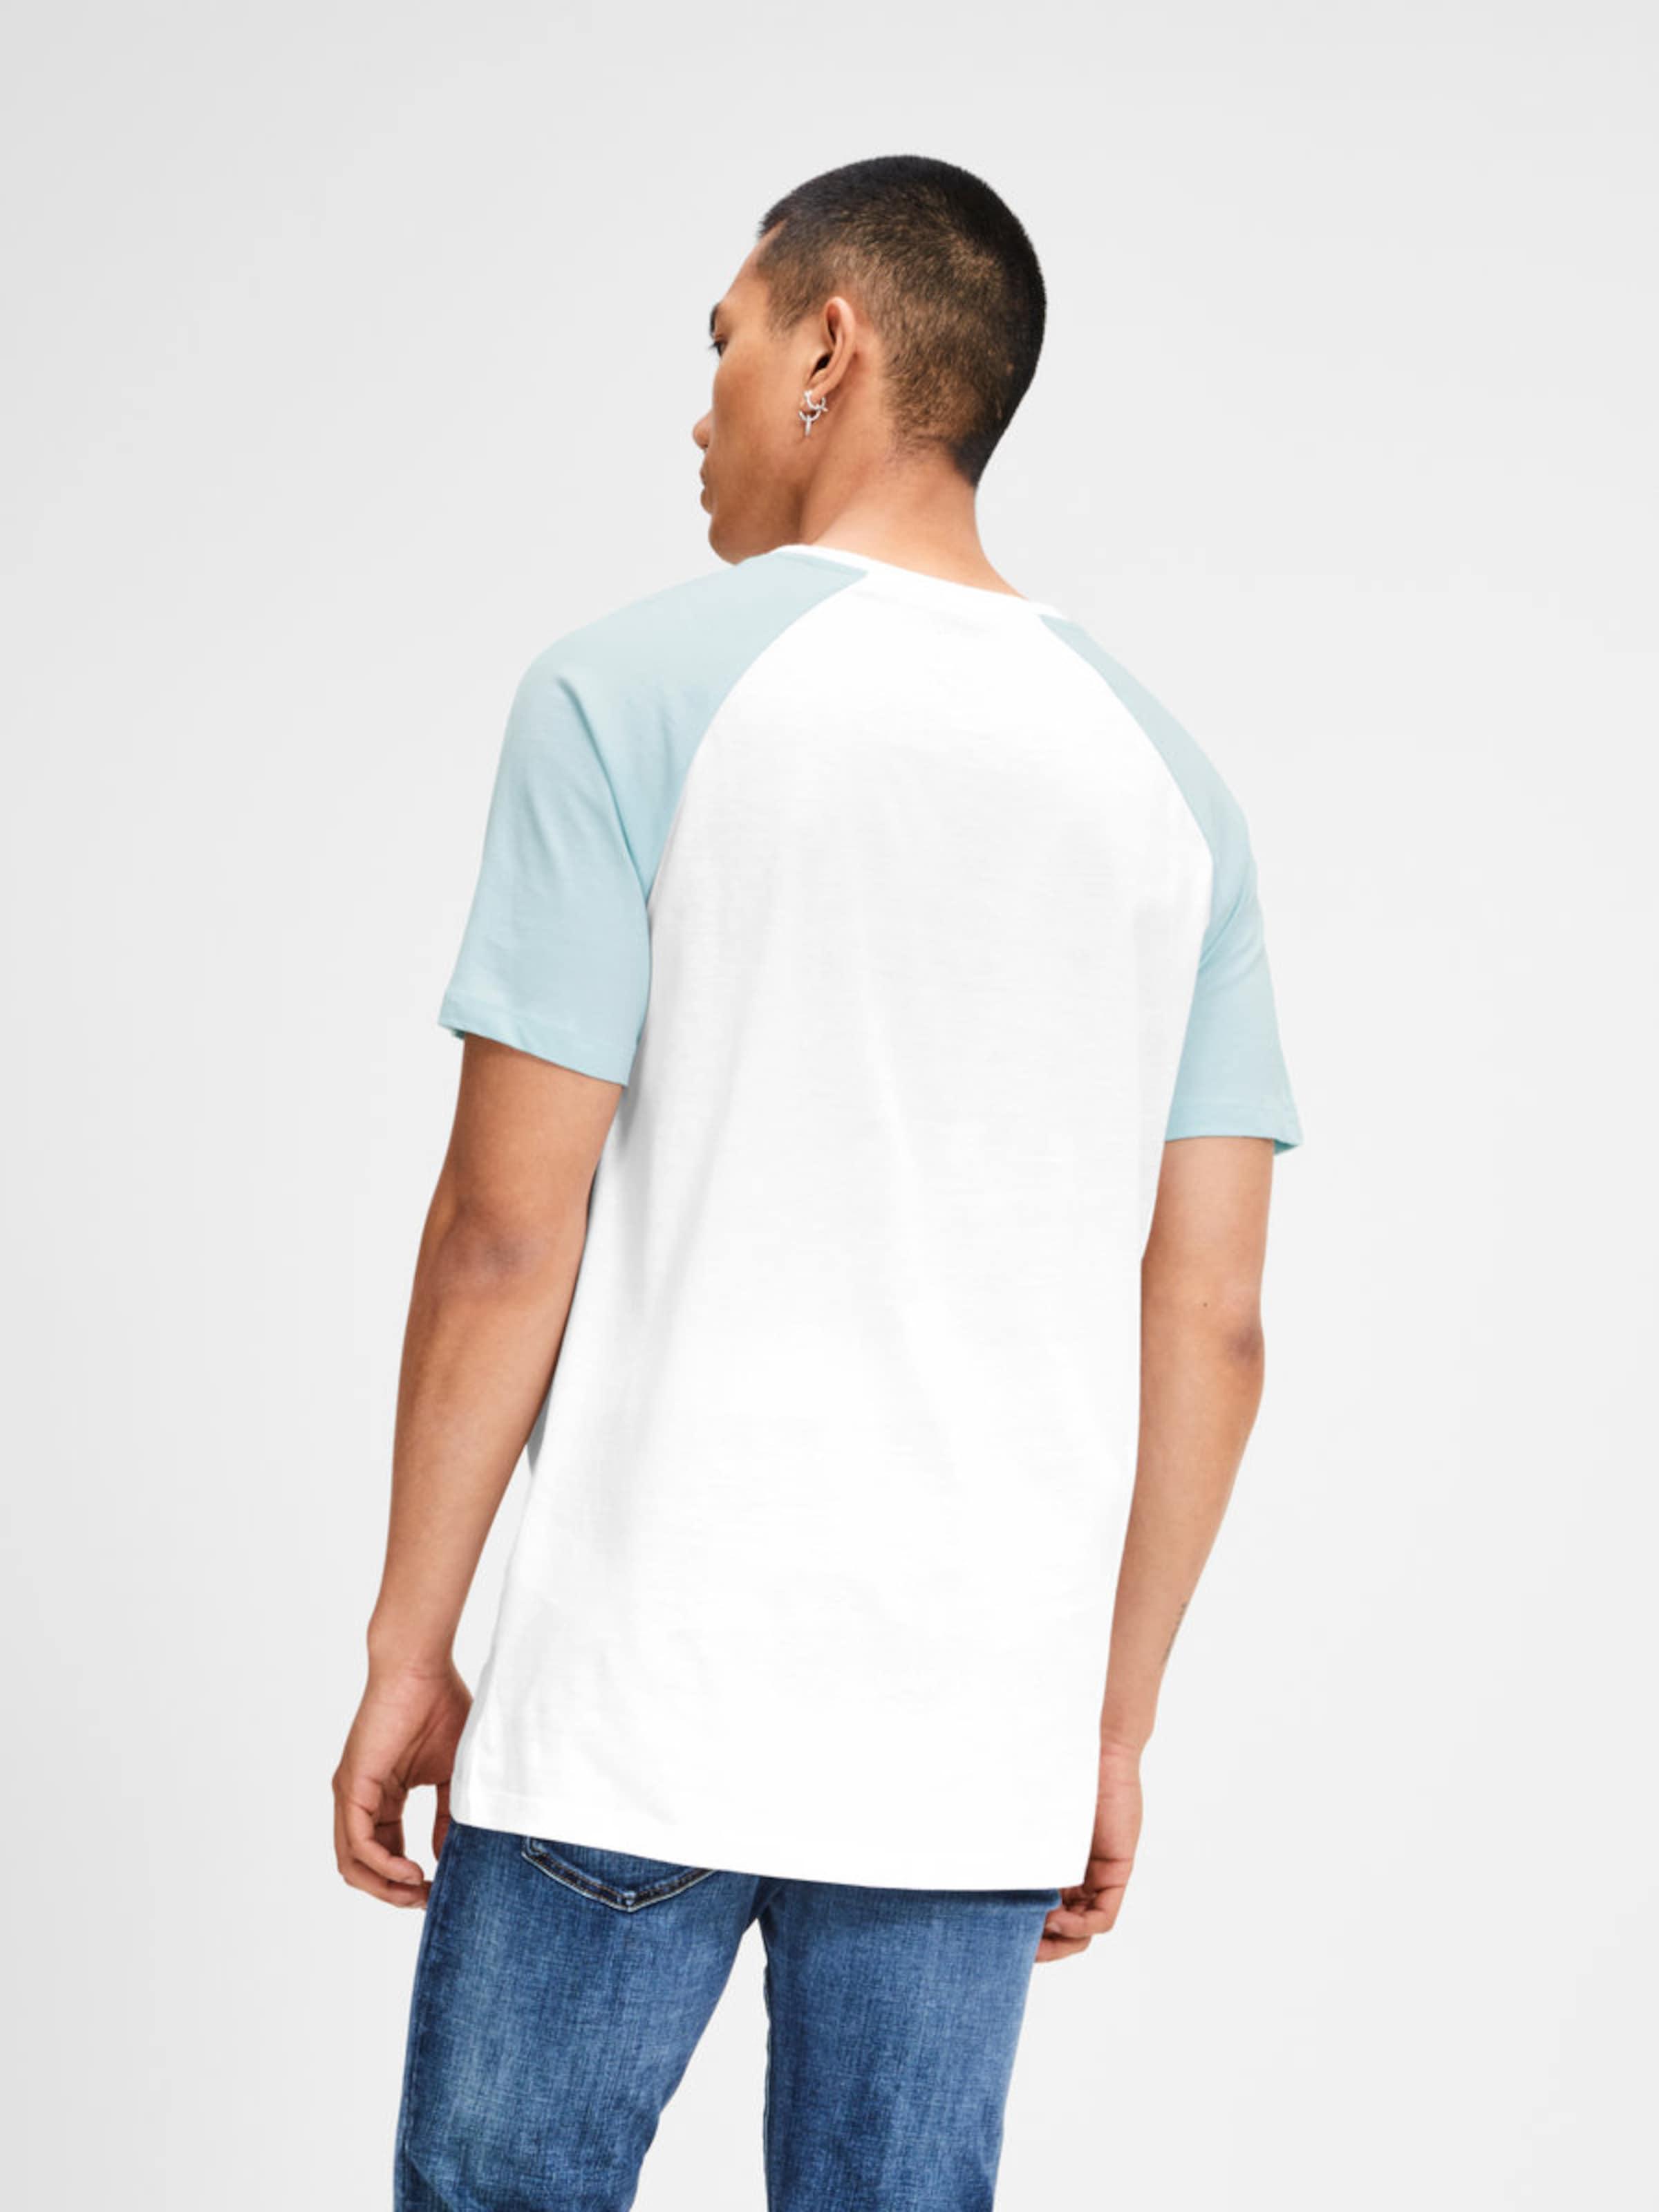 En T shirt Jones ClairBlanc Jackamp; Bleu uJ3TlK1Fc